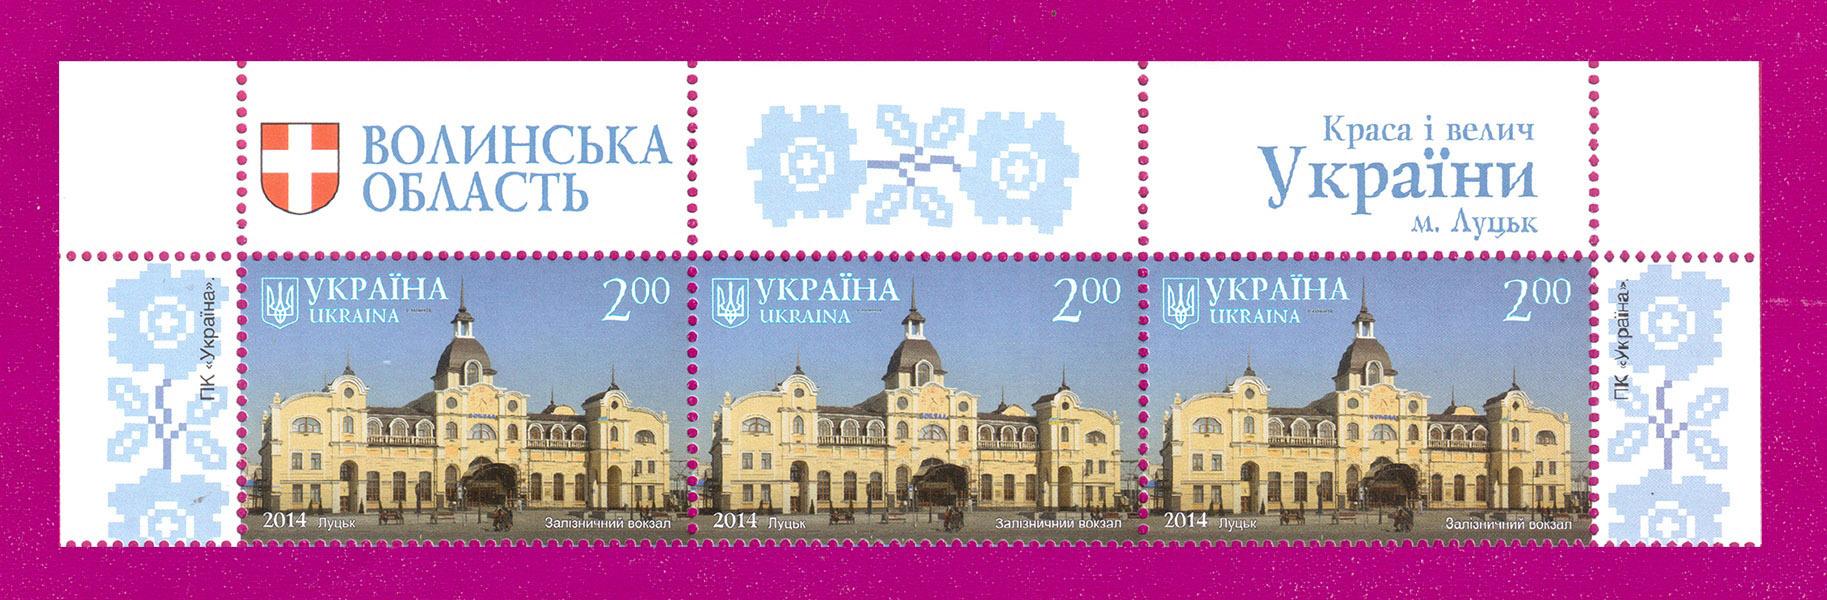 Ukraine stamps Part of the Minisheet Railway Station. Lutsk UP